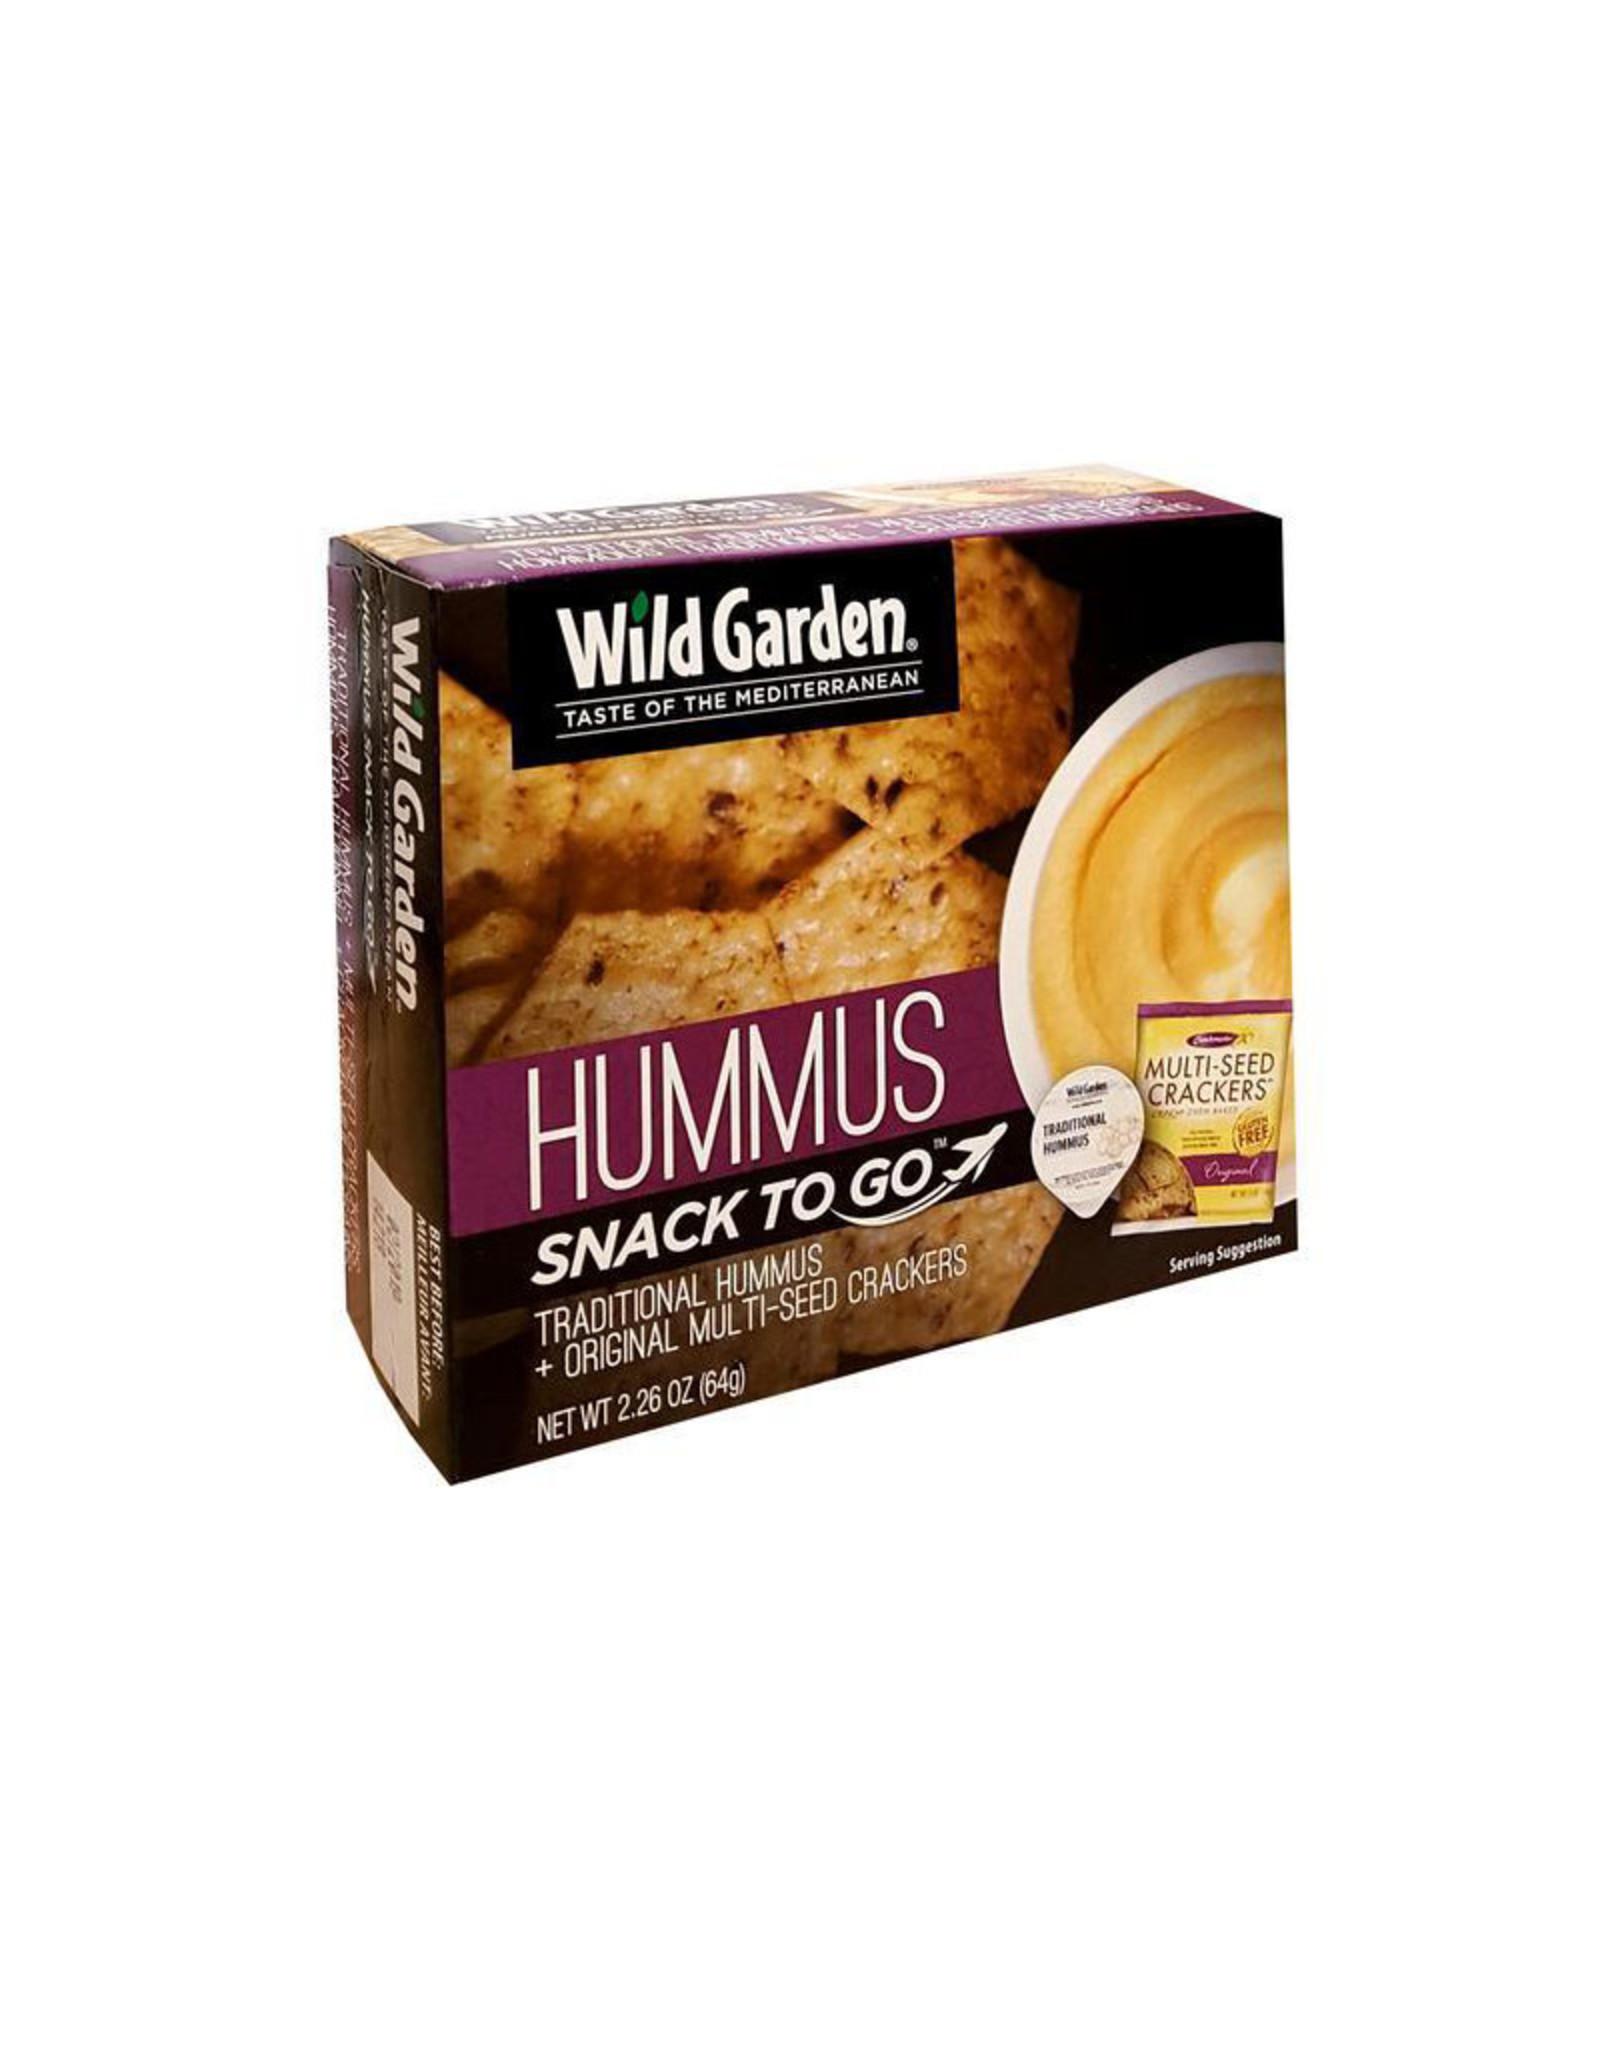 Wild Garden Wild Garden - Snack Box, Traditional Hummus & Original Multi-Seed Crackers